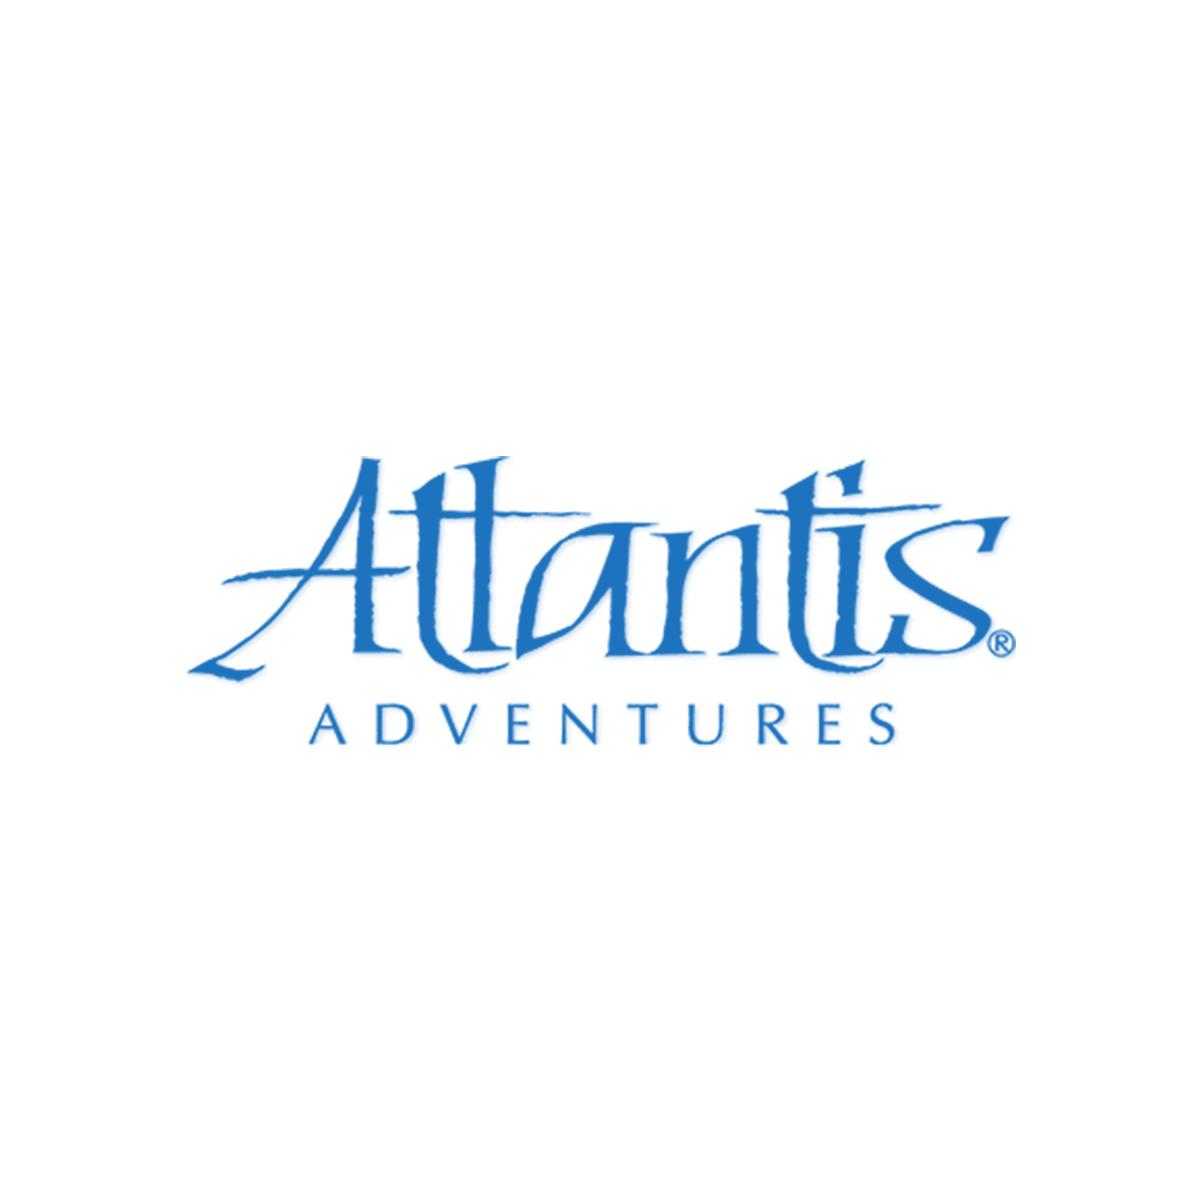 https://www.everydayvoip.uk/wp-content/webpc-passthru.php?src=https://www.everydayvoip.uk/wp-content/uploads/2020/05/atlantis_logo.jpg&nocache=1